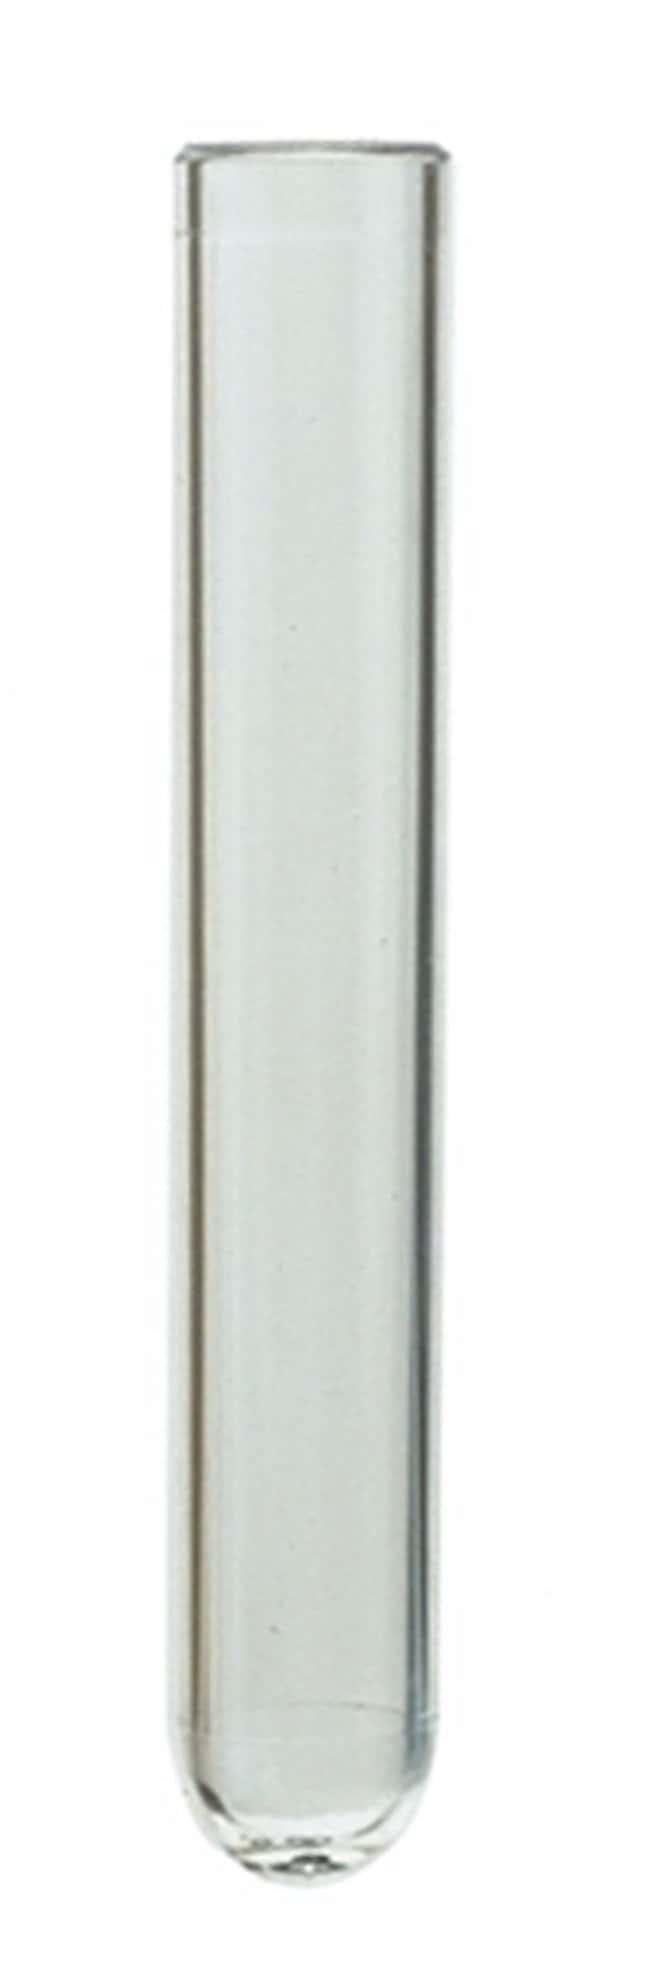 DWK Life Sciences Kimble Plain Disposable Plastic Tubes 12x75mm Polypropylene